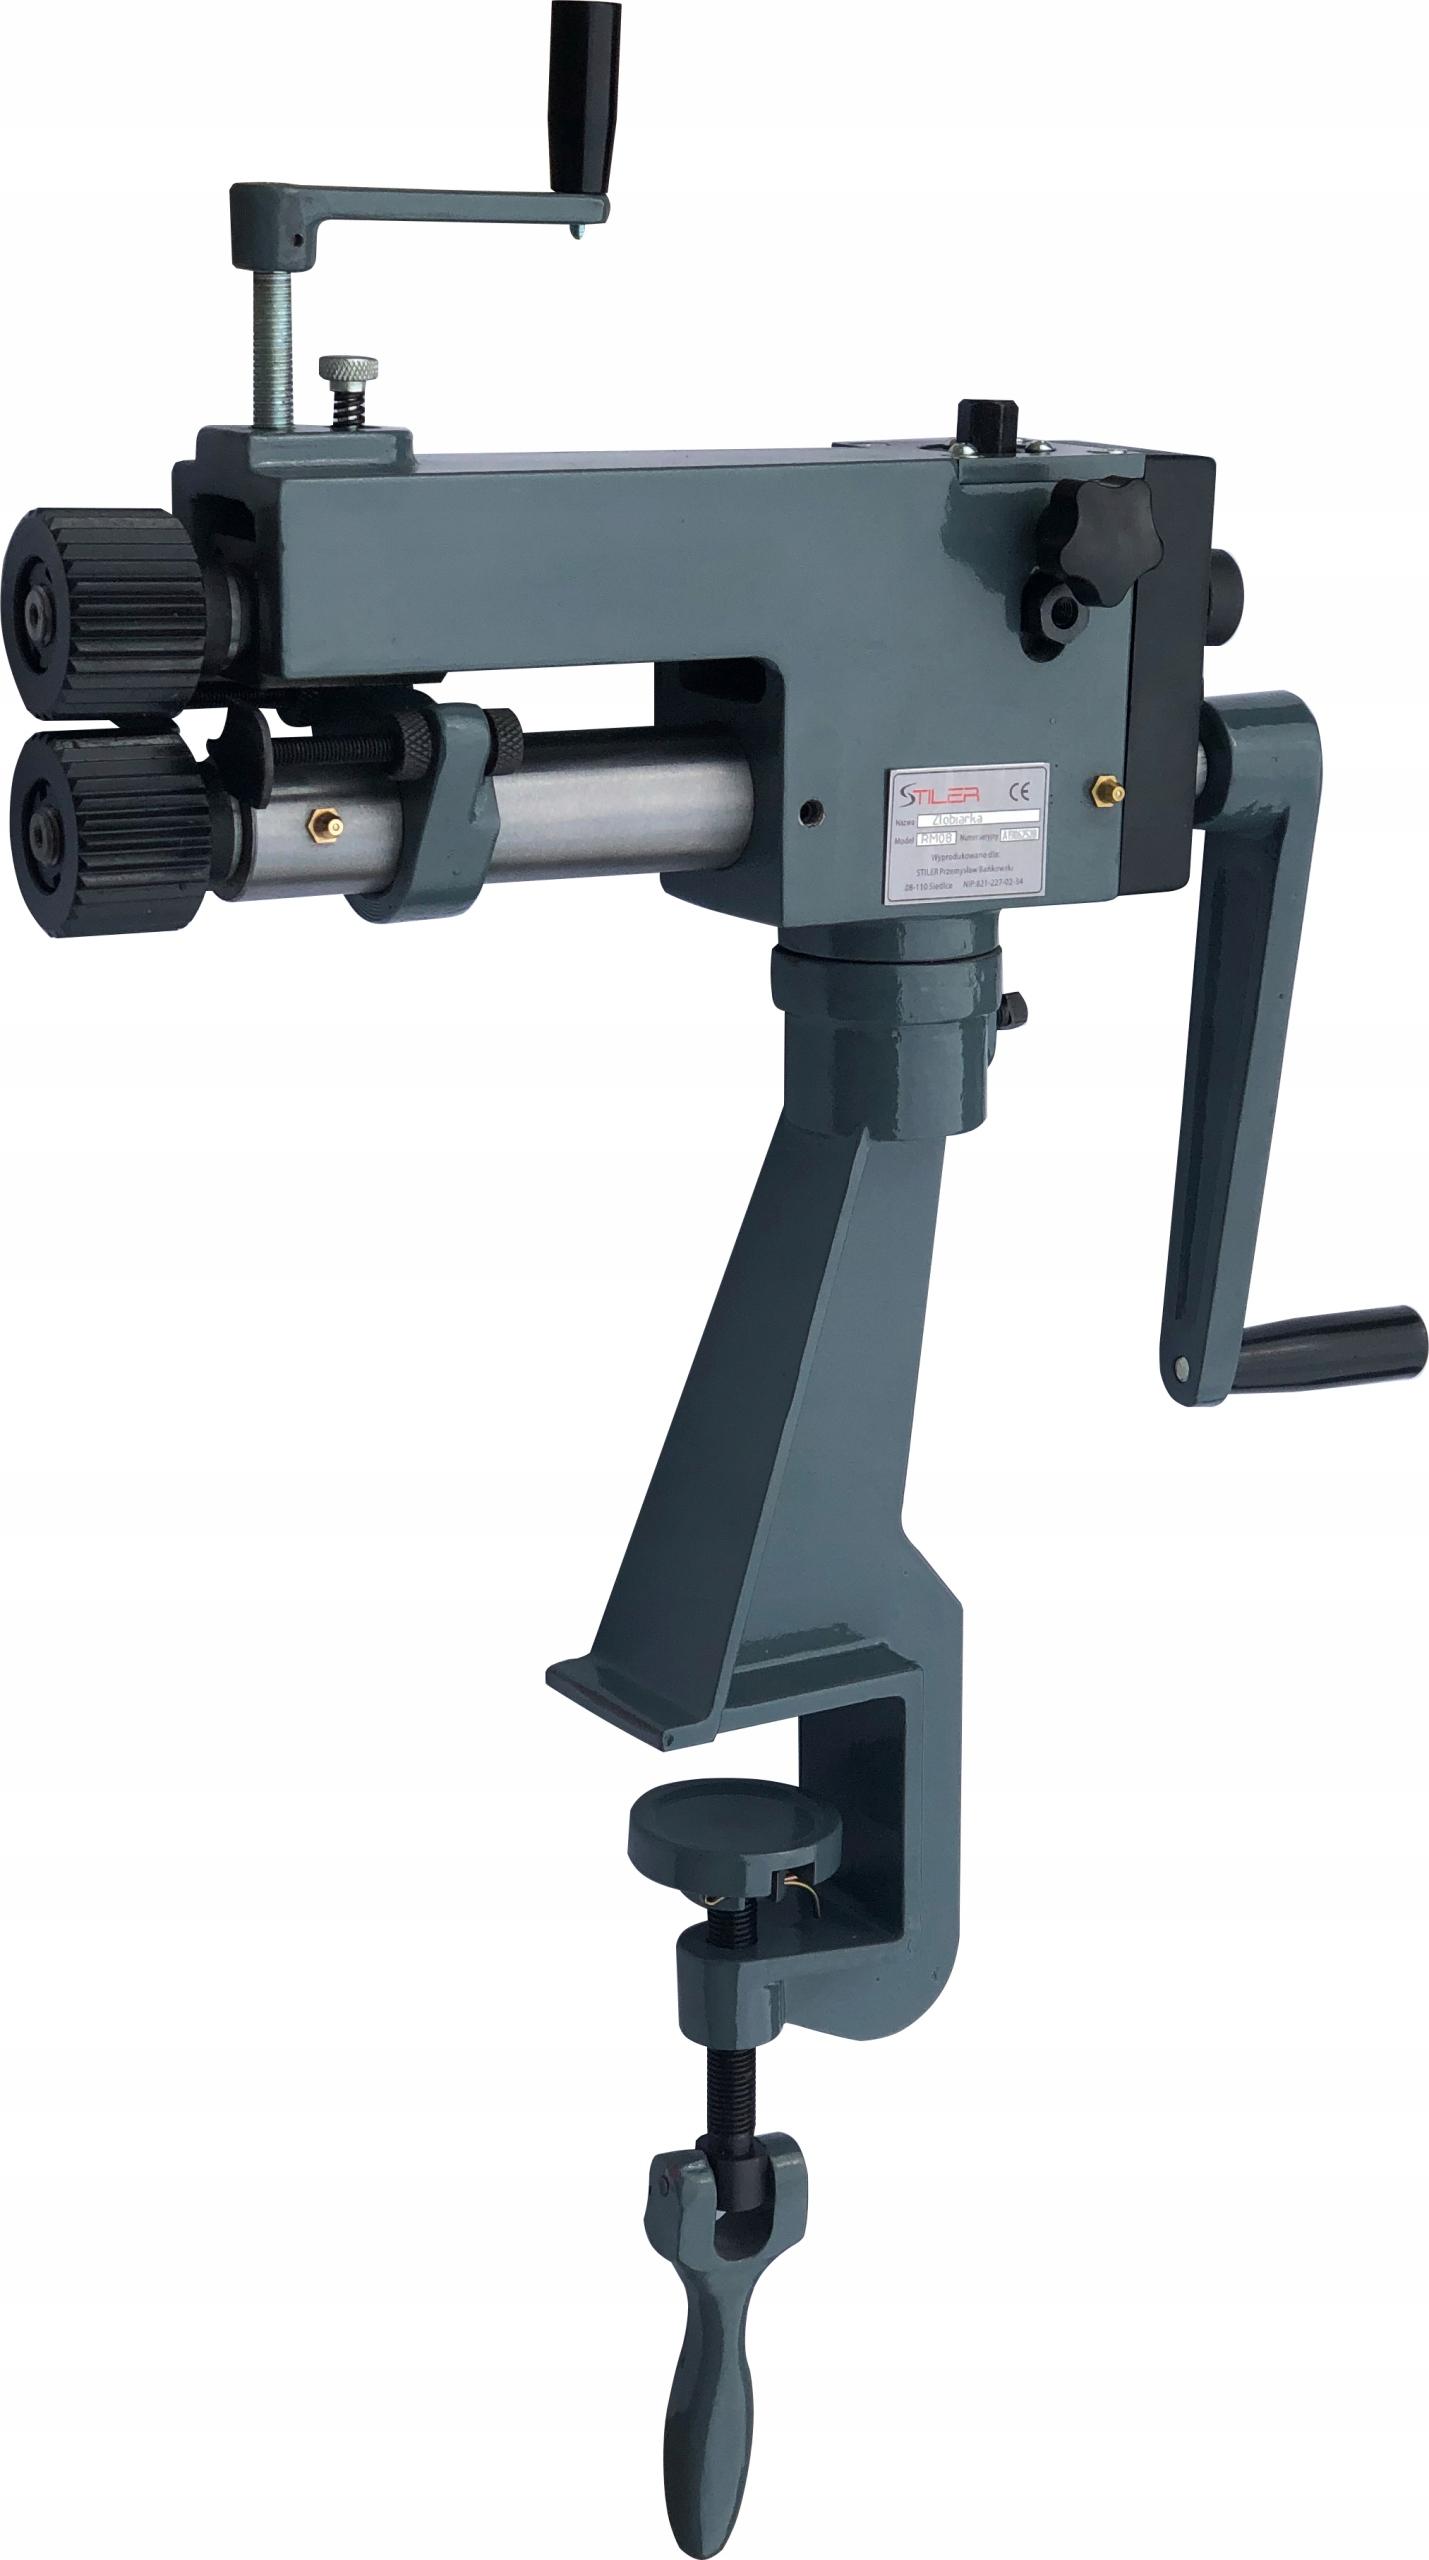 STILER RM08 STRONG ROLLER GROOVING MACHINE ROLLING MACHINE HIT Вага продукту з індивідуальною упаковкою 30 кг